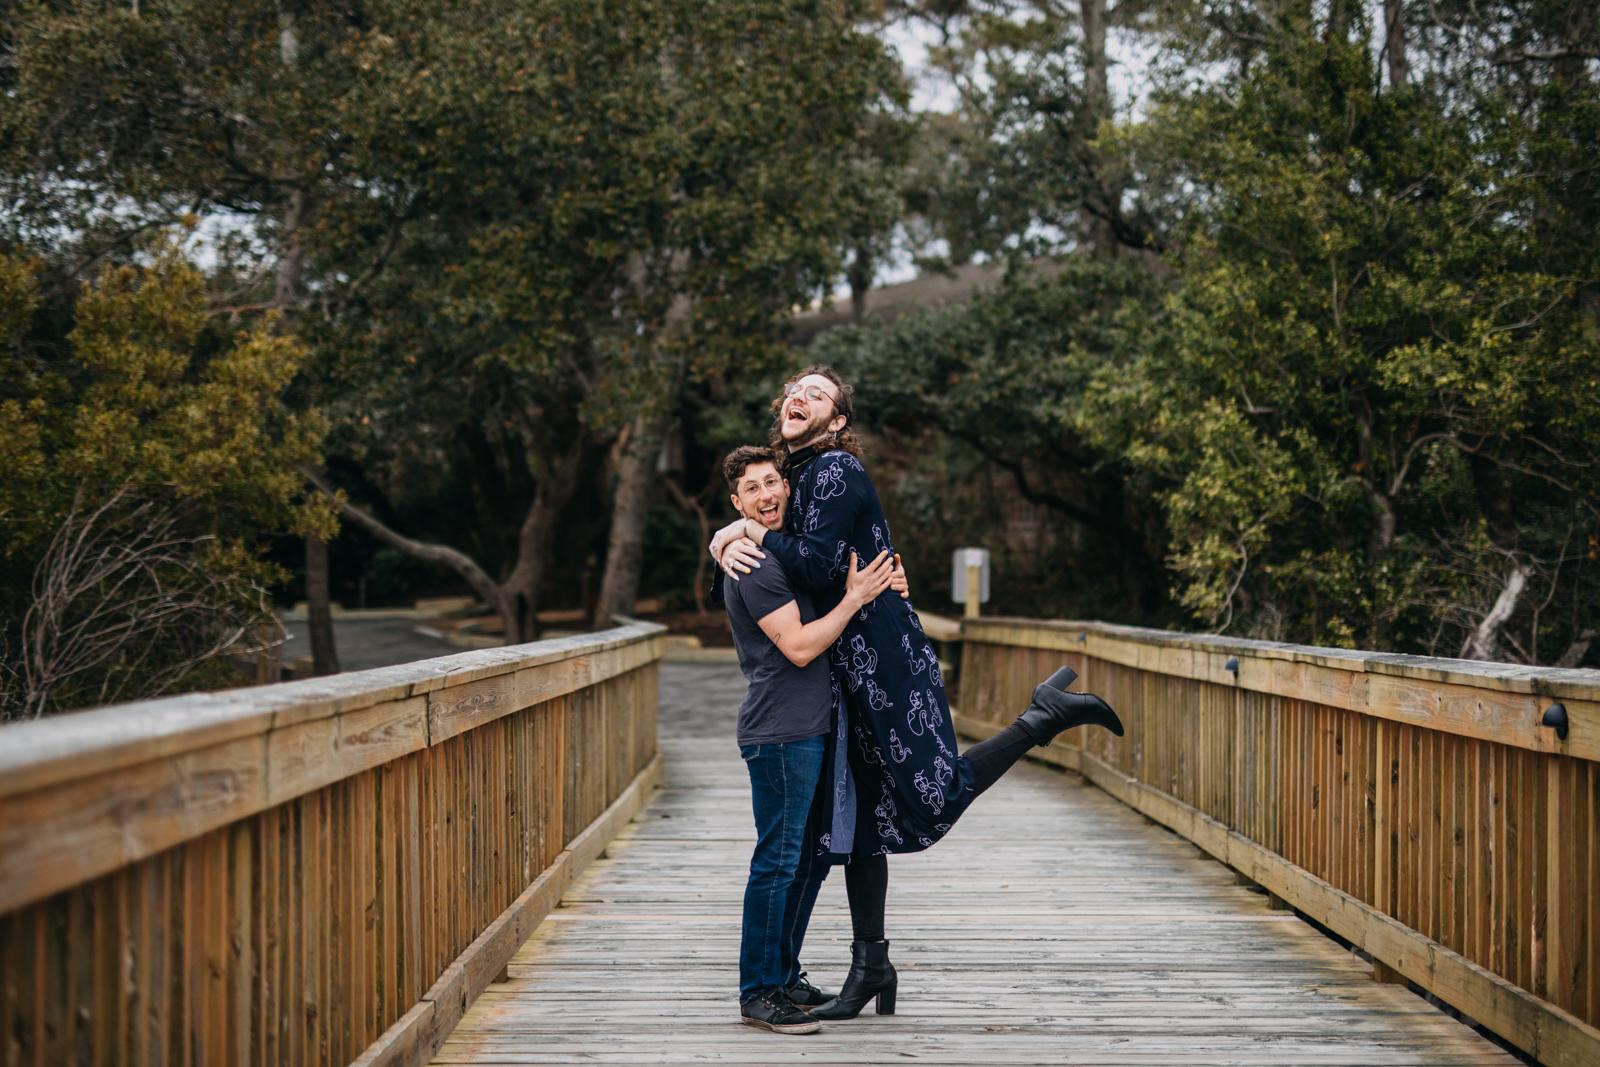 trans-couple-queer-photographer4.jpg